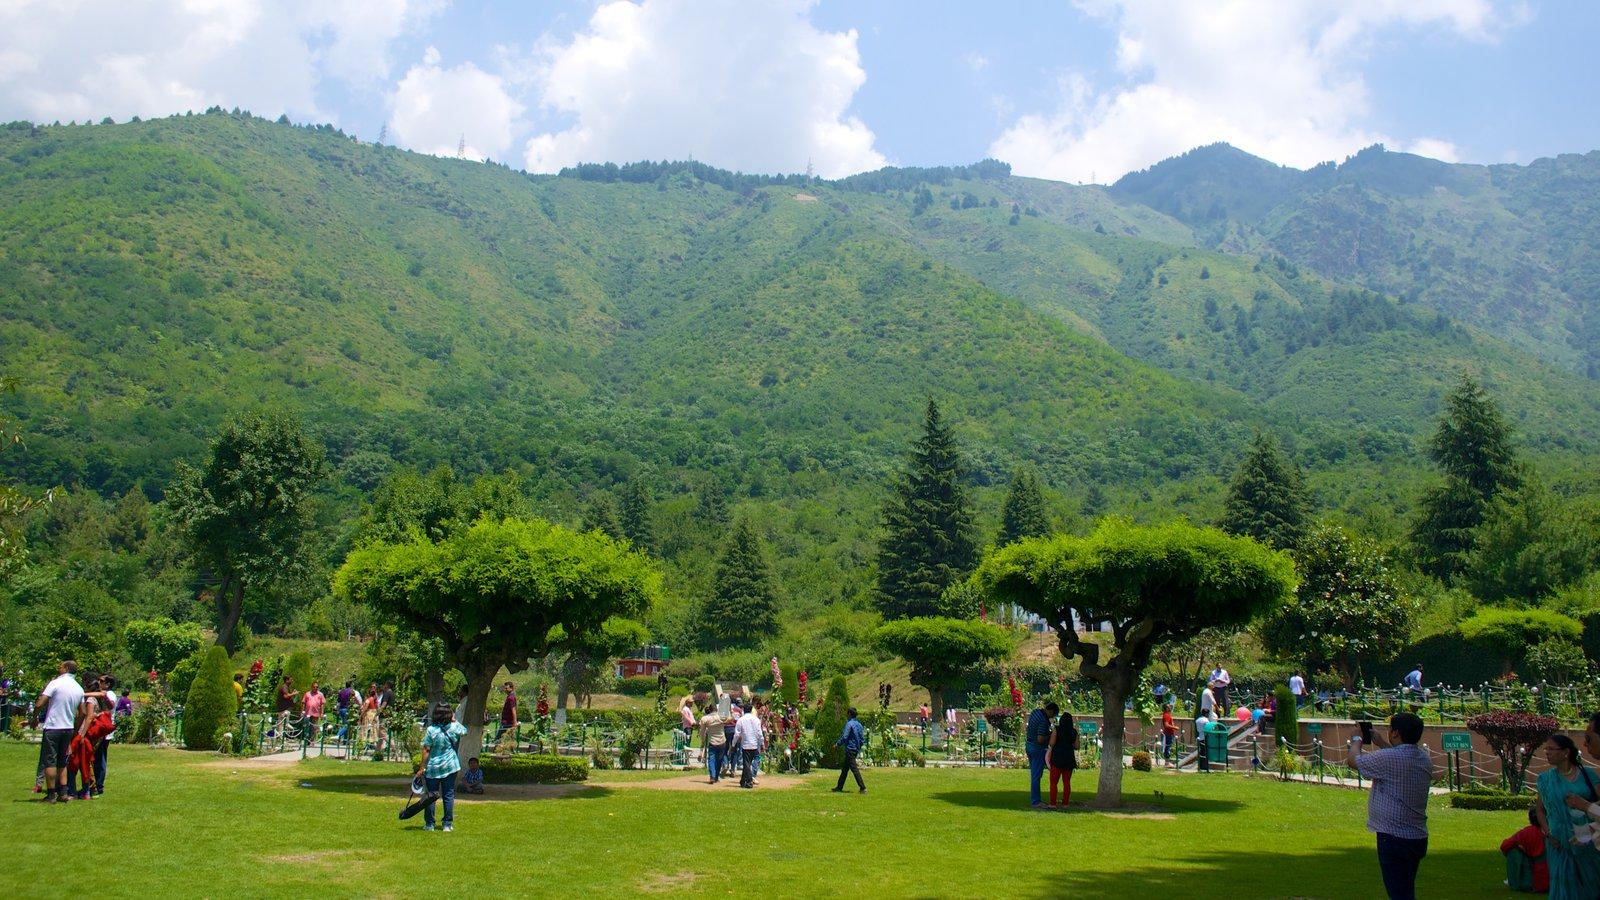 Chashma Shahi Garden featuring a garden